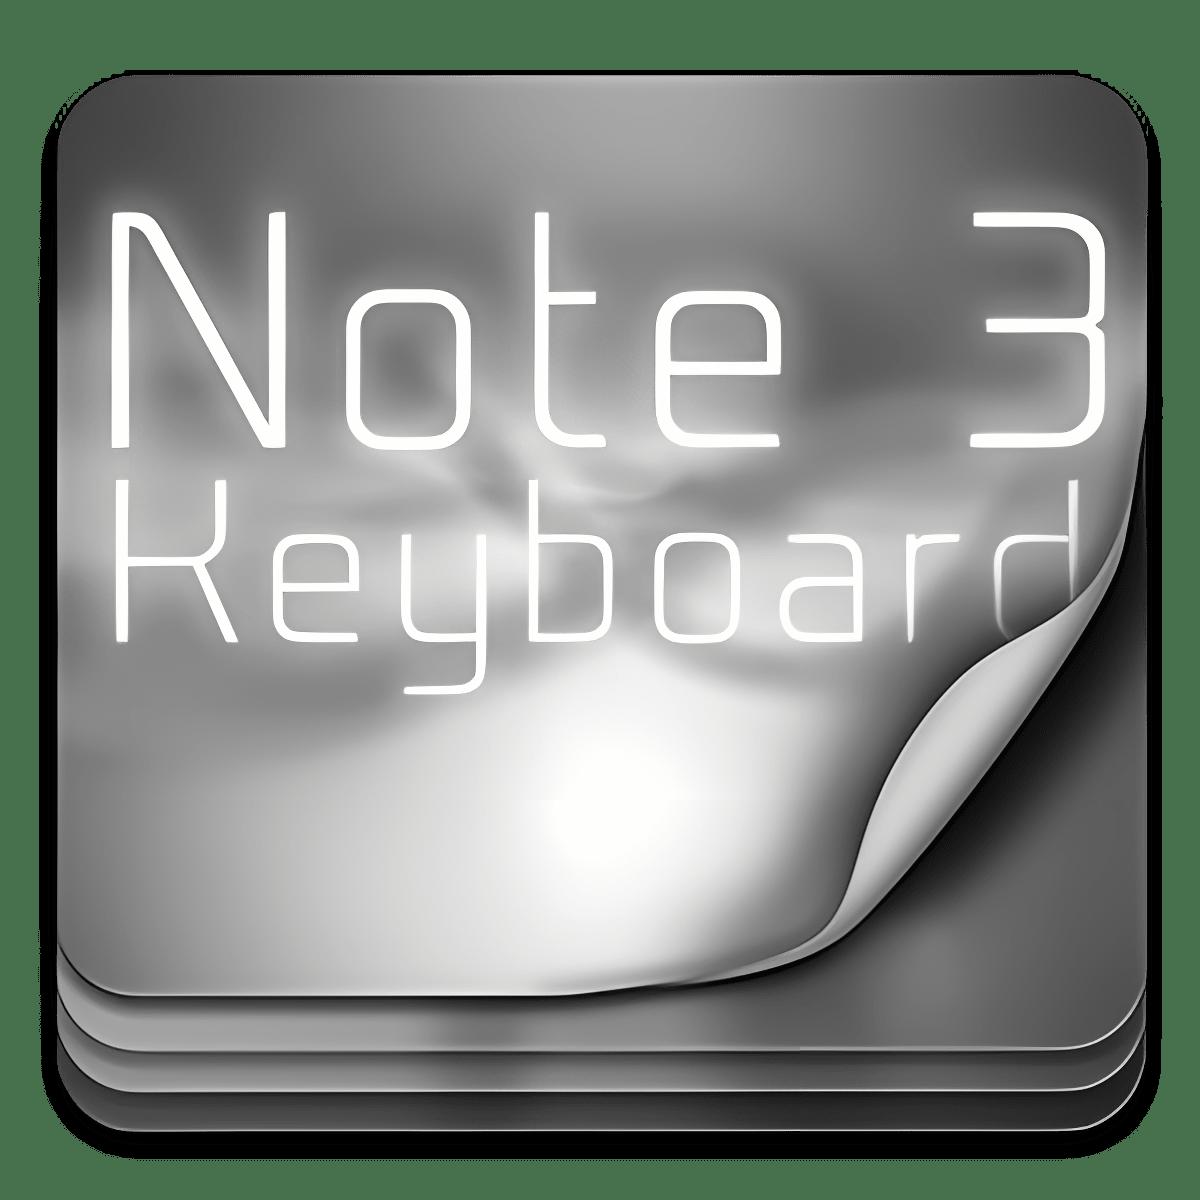 Ir teclado para la nota 3